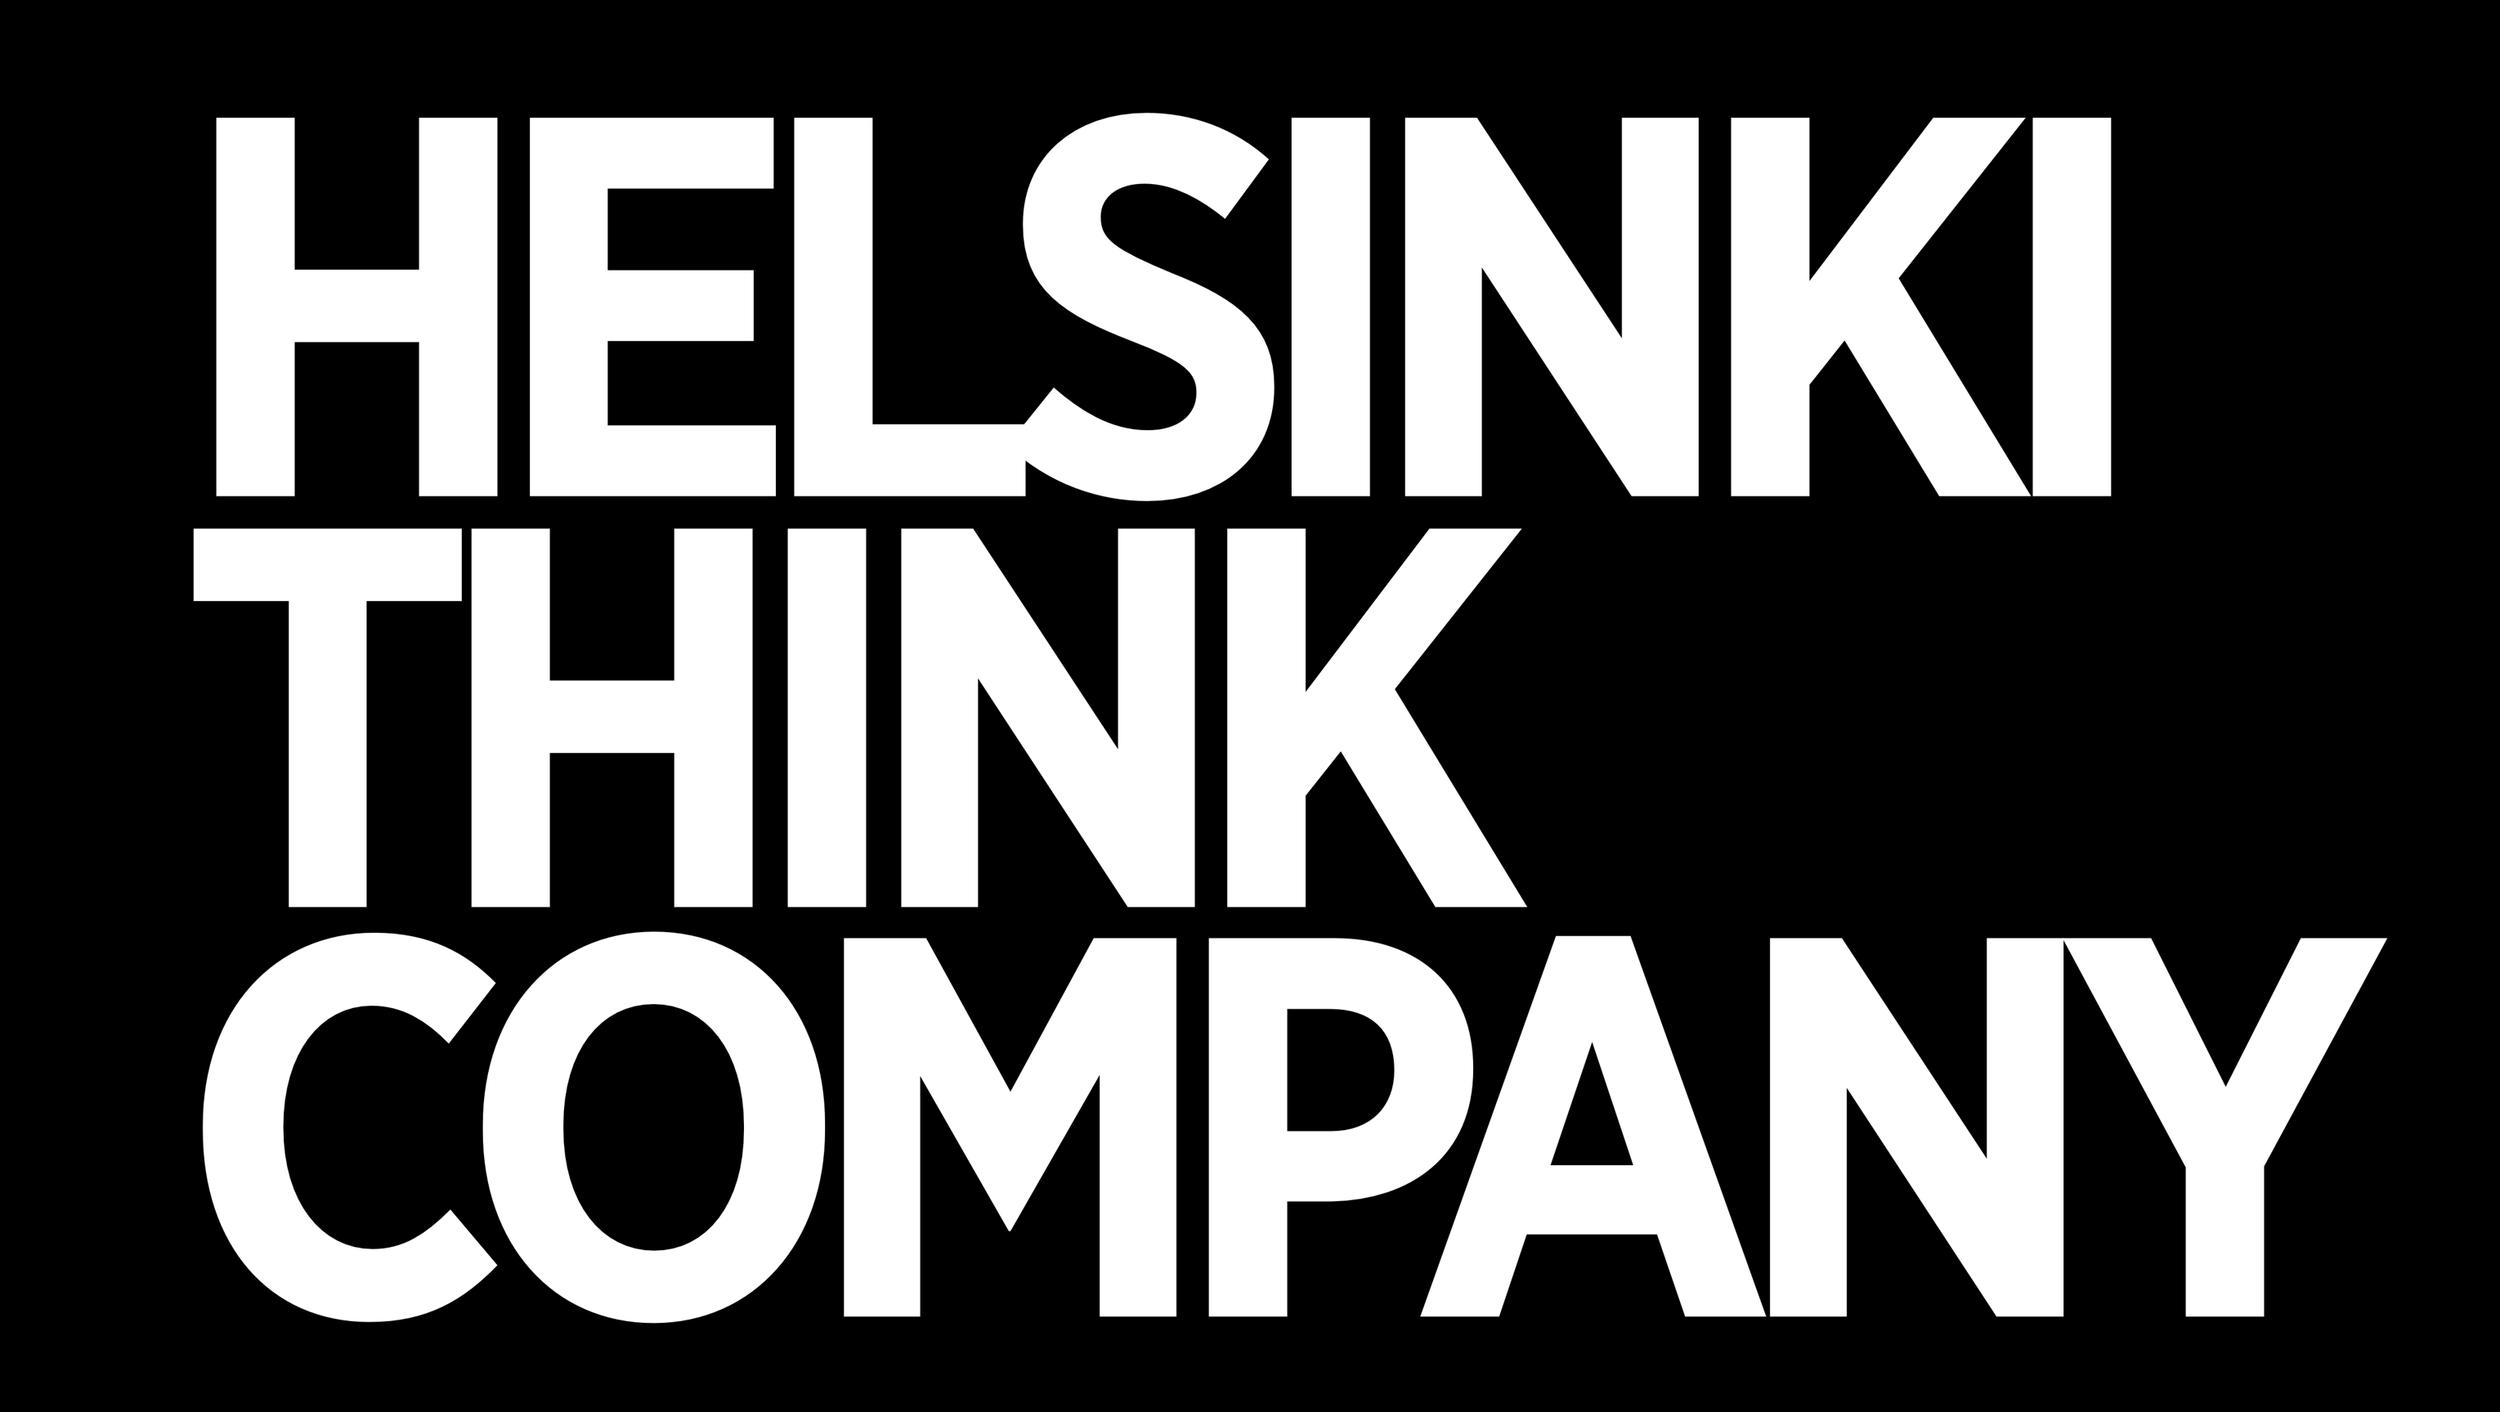 Helsinki Think Company.png